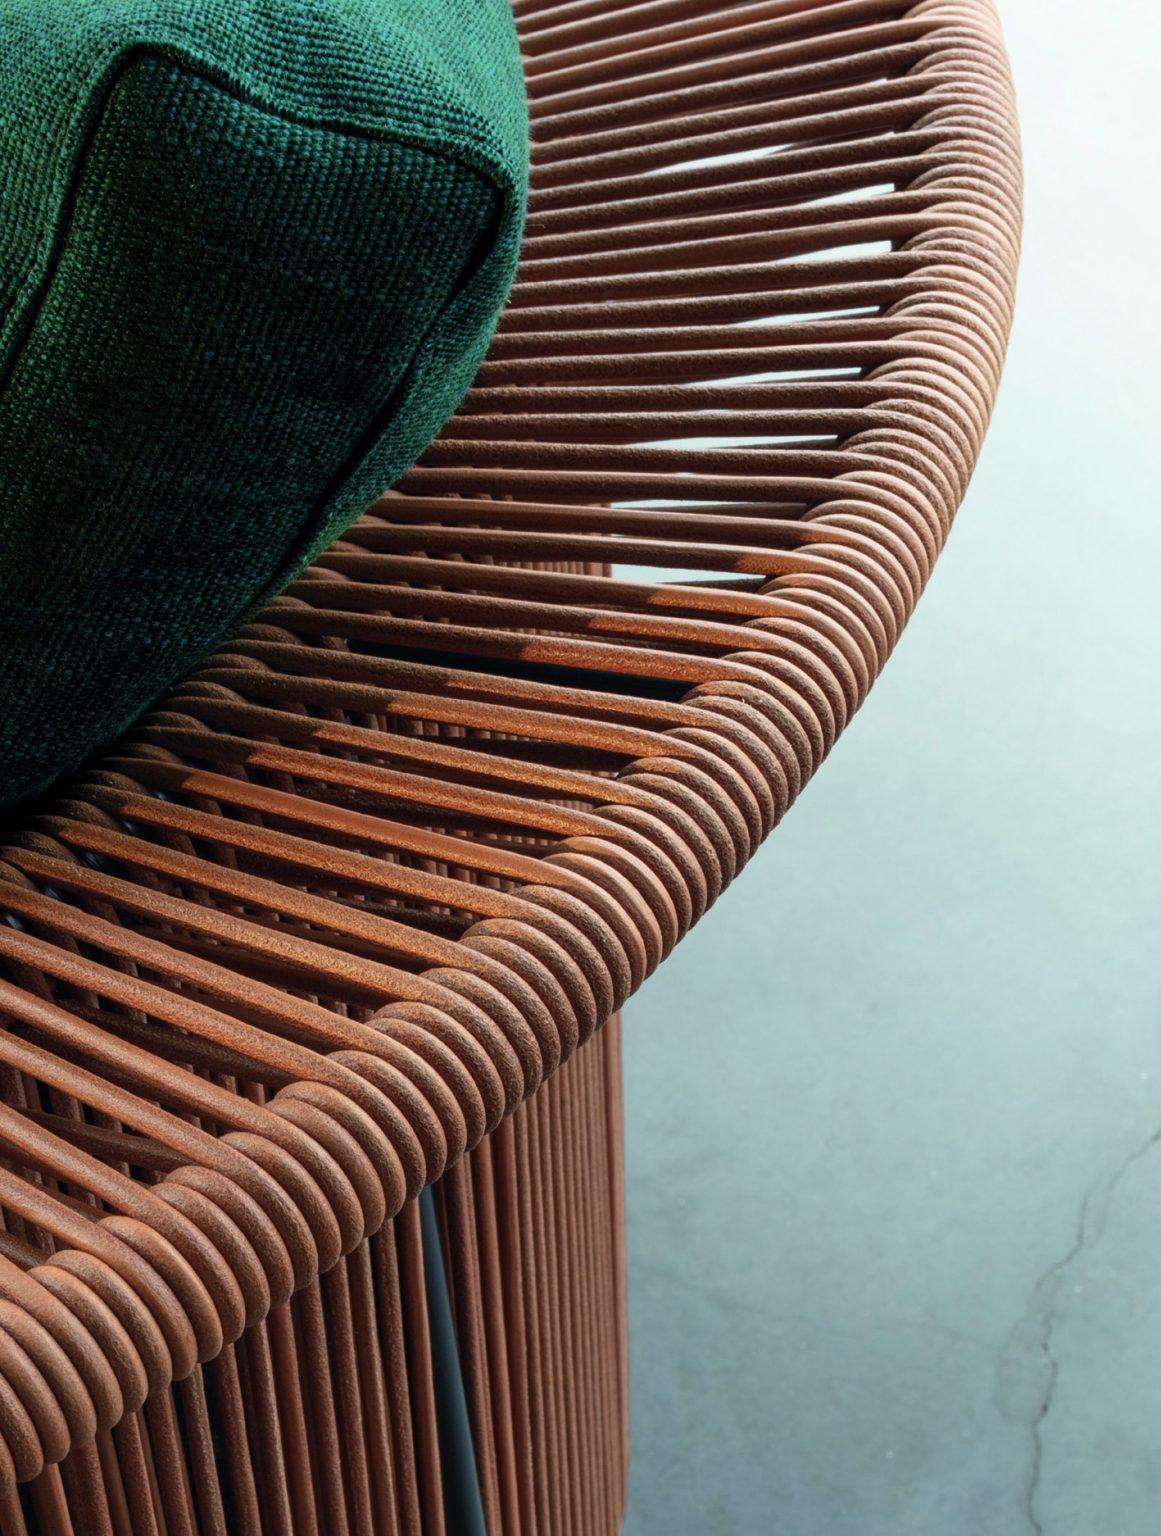 Biennale Interieur - Belgium's leading design and interior event - Lema-alton-david-lopez-quincoces-2.jpg